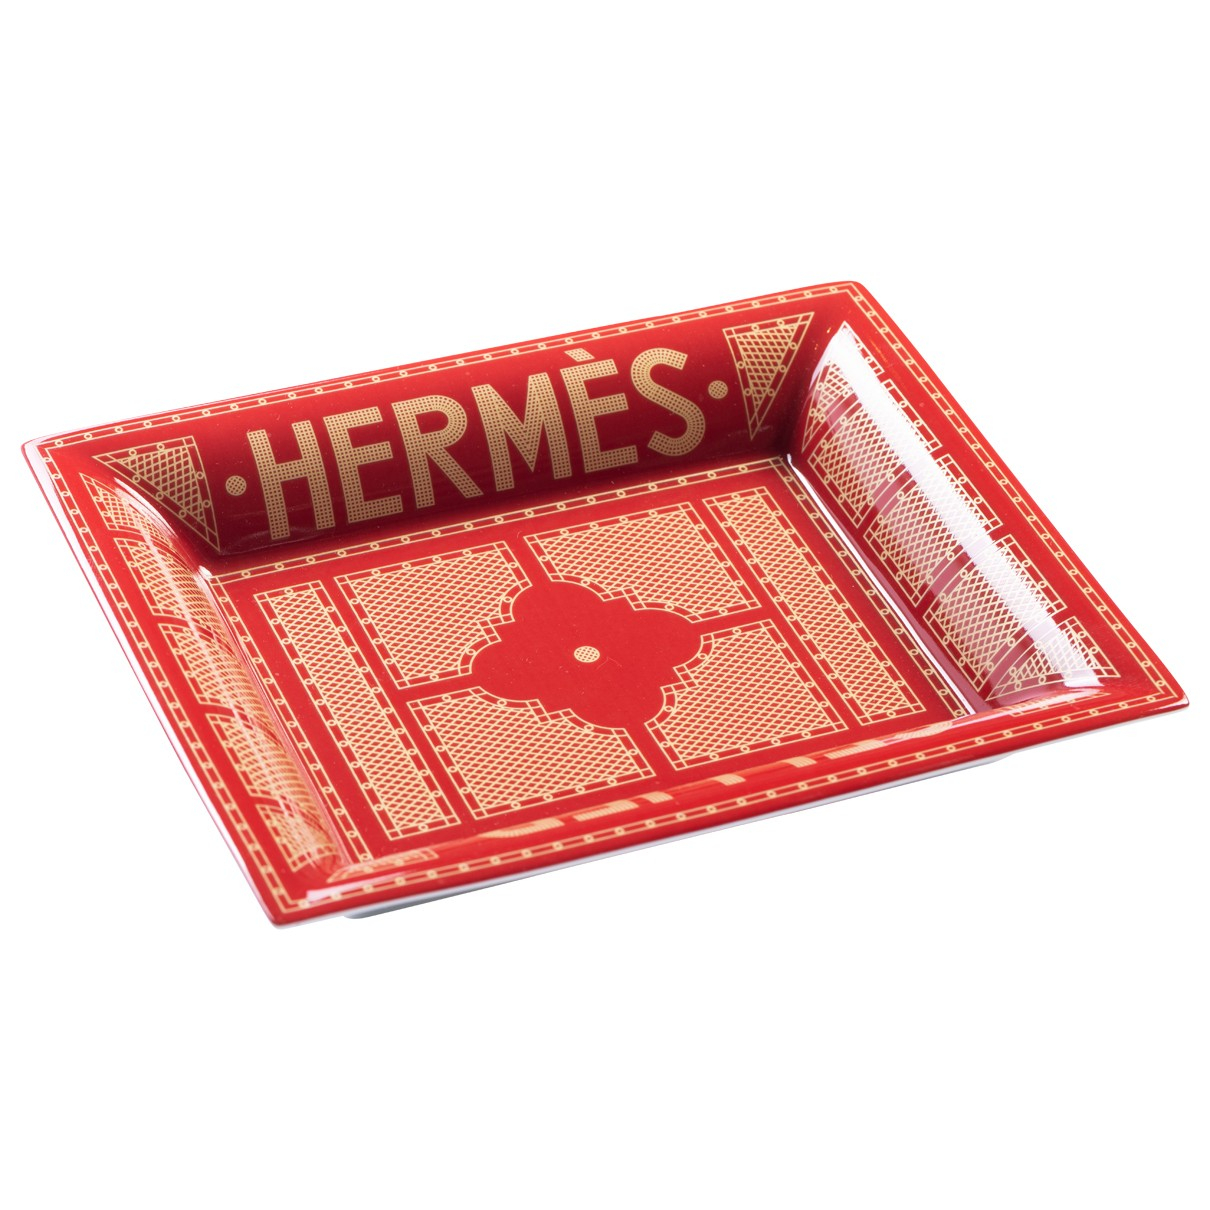 Cenicero de Porcelana Hermes